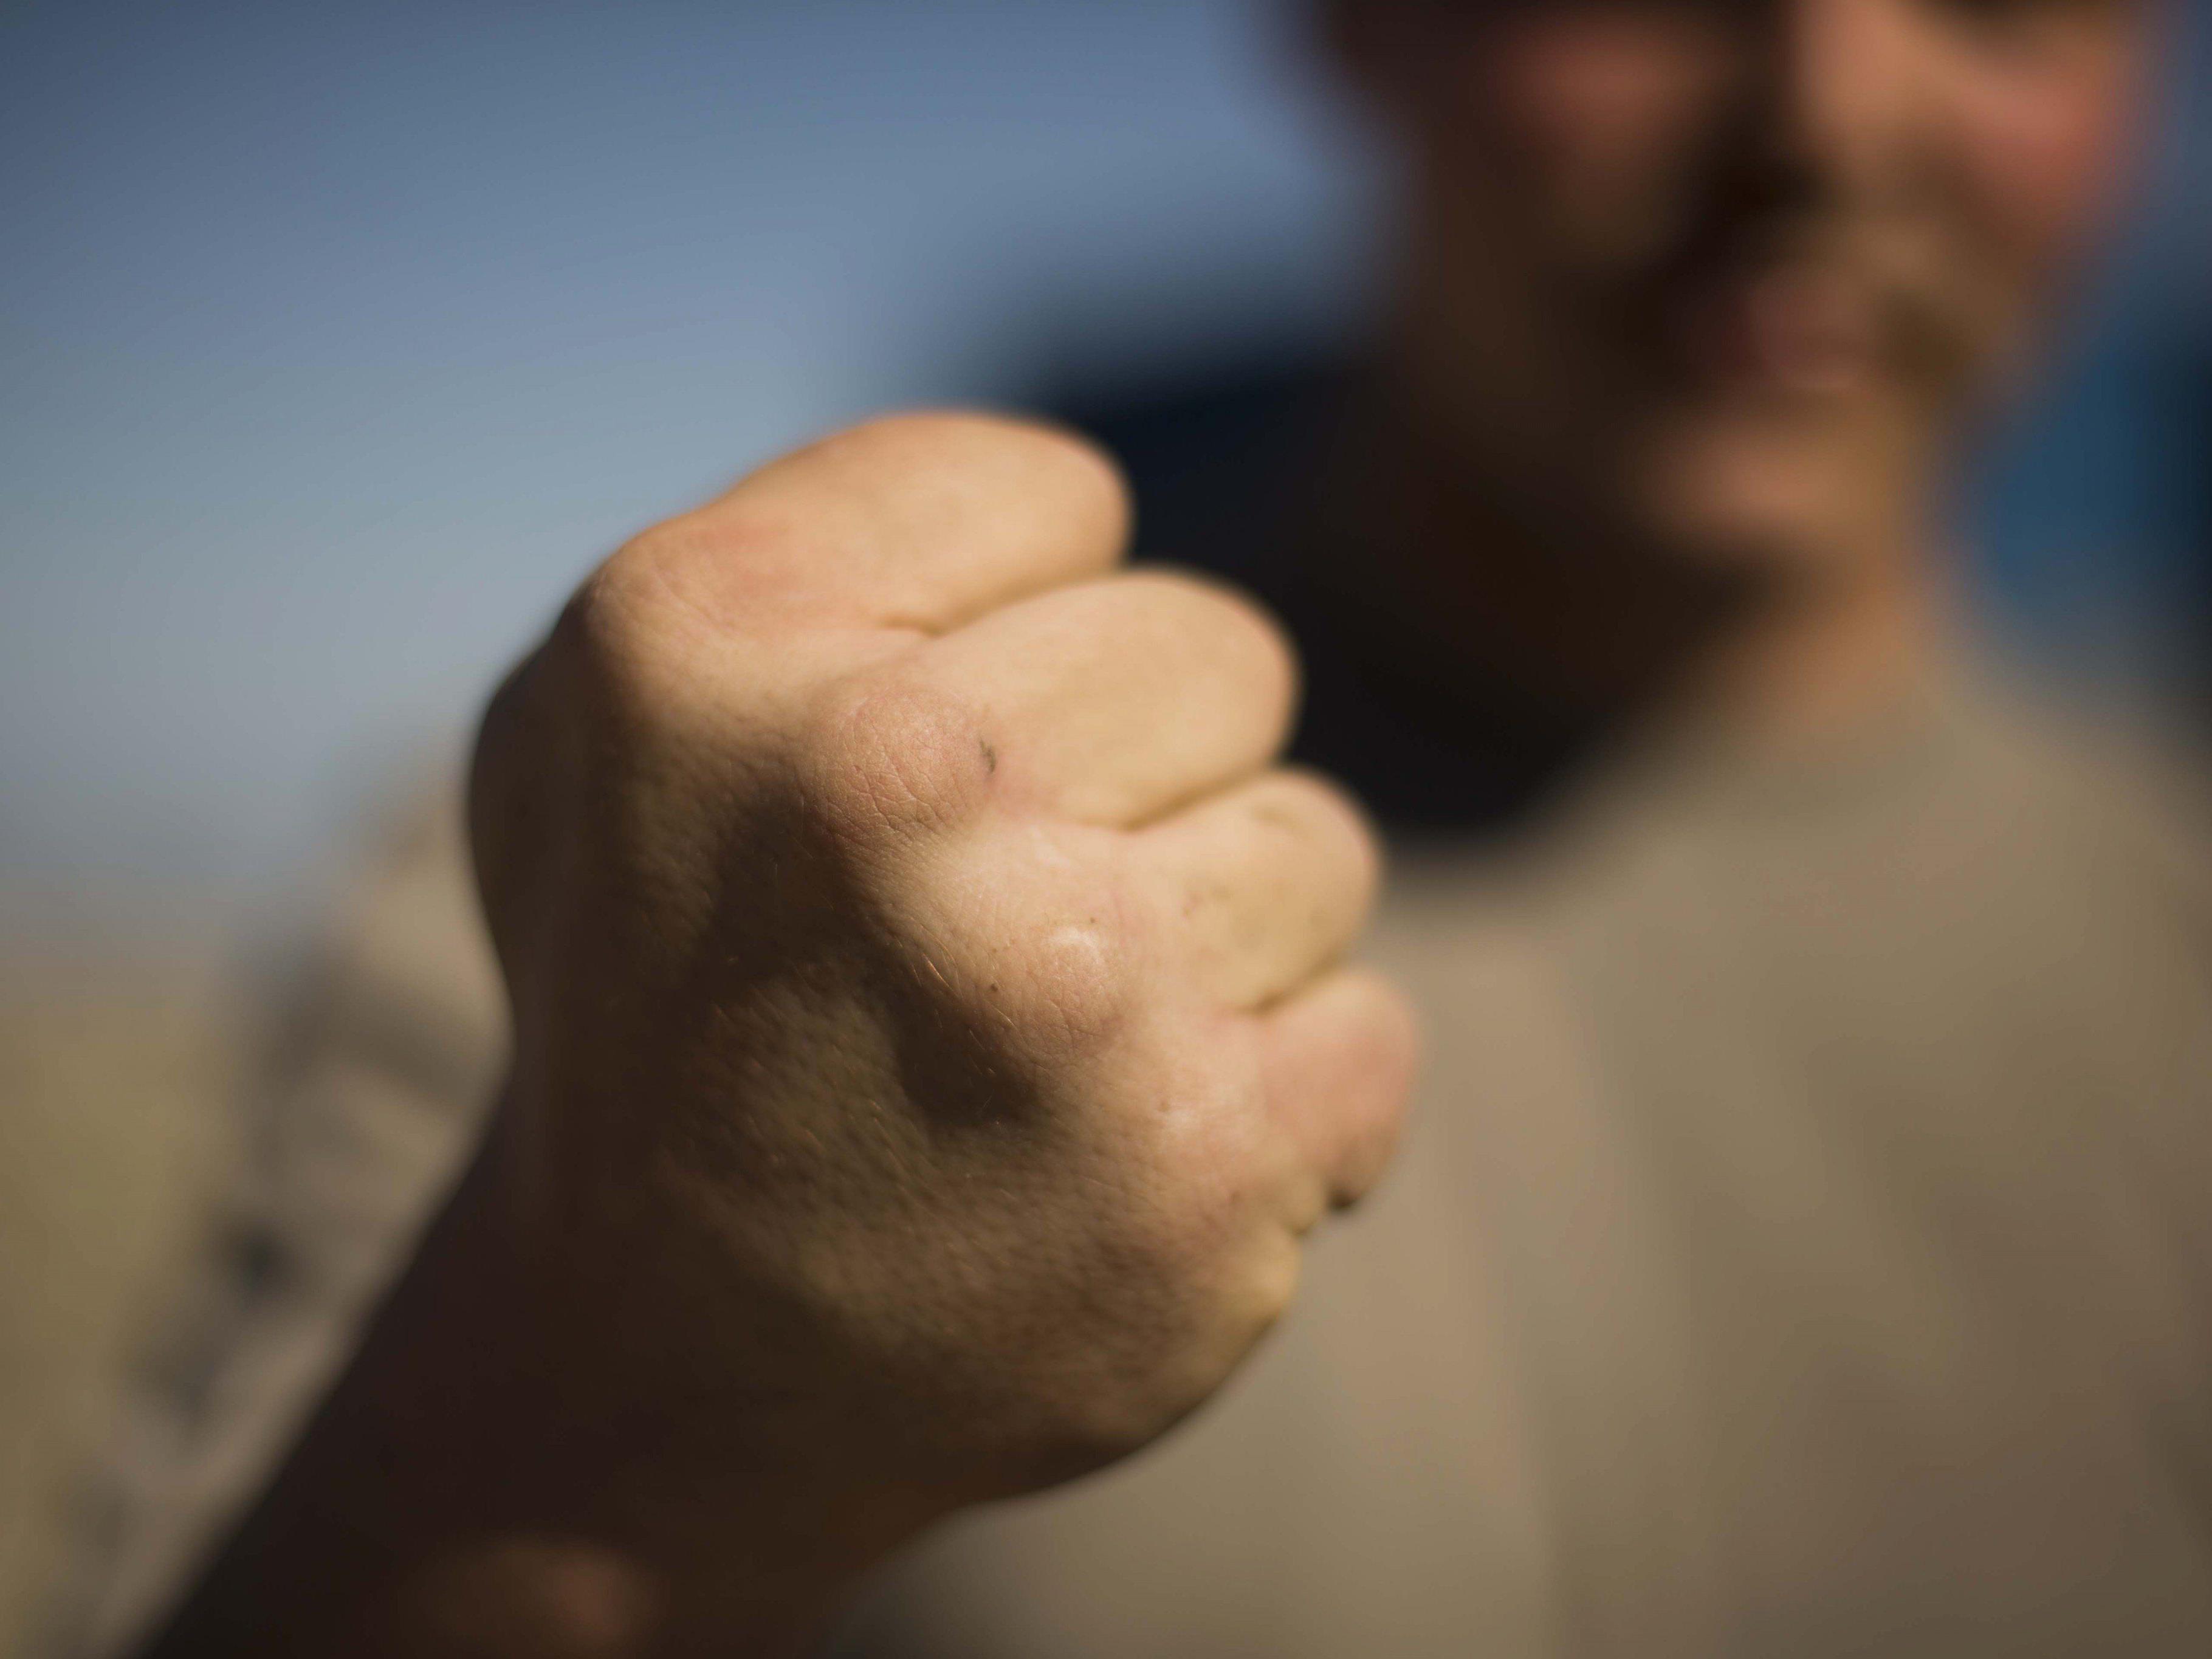 Sechs junge Männer wegen brutaler Attacke vor Gericht.